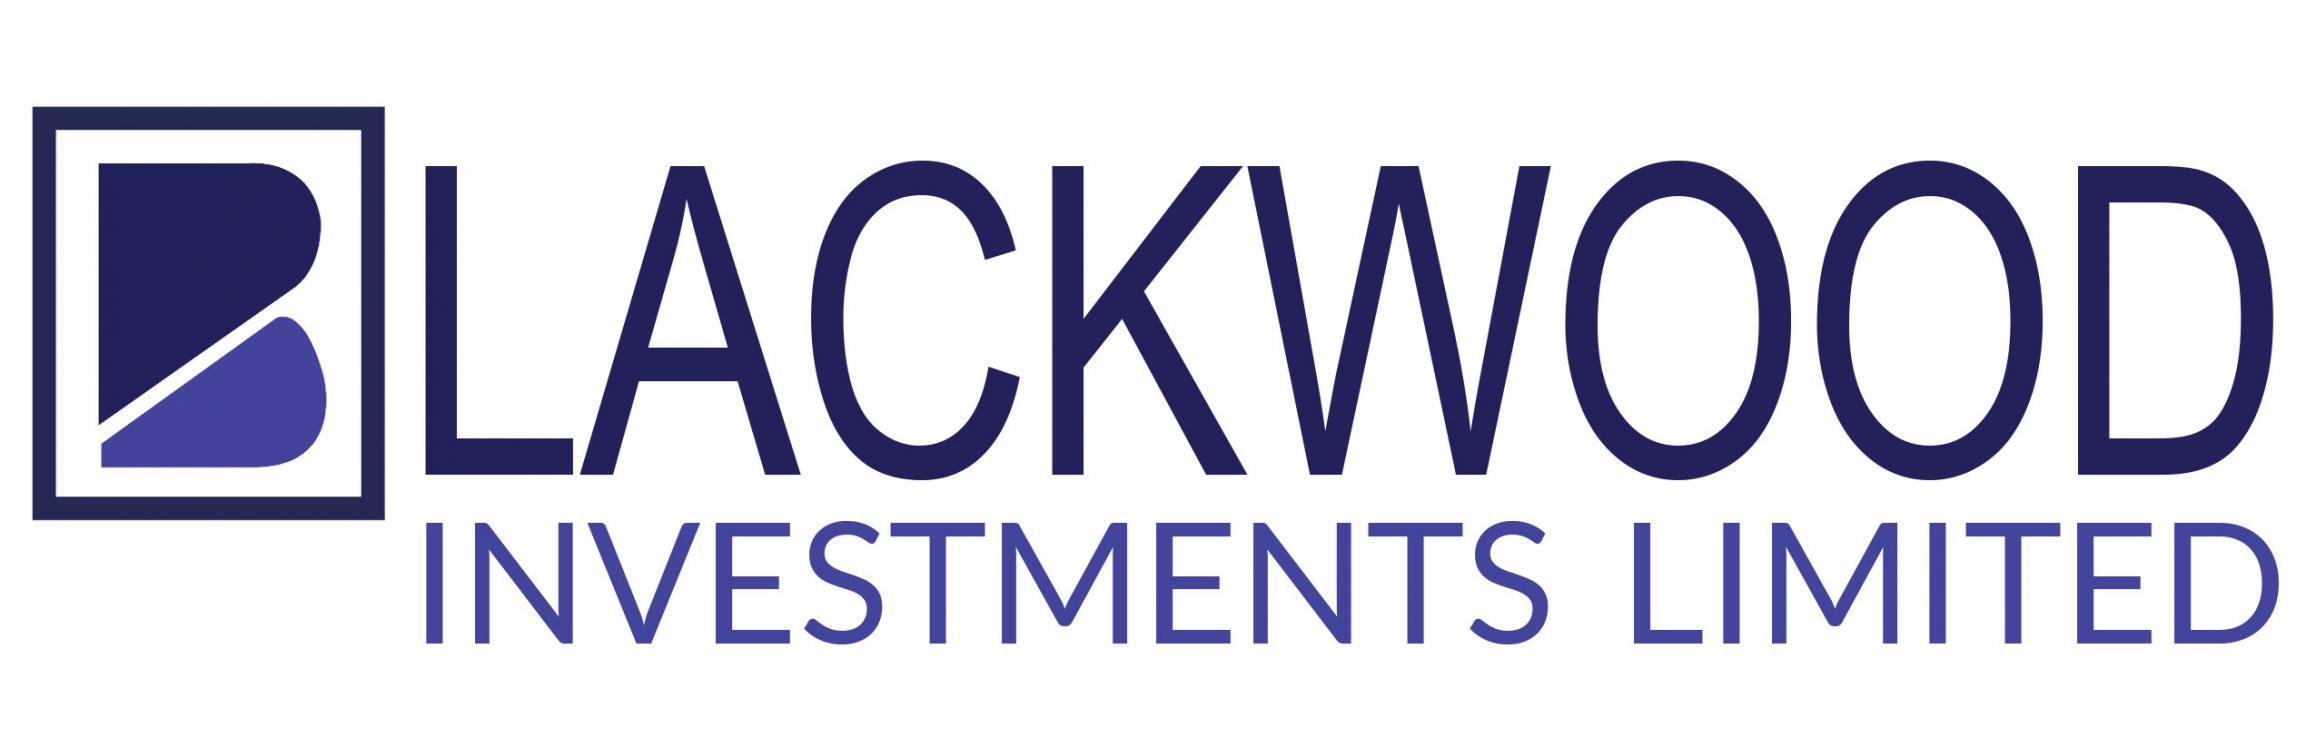 Blackwood Investments Limited Logo